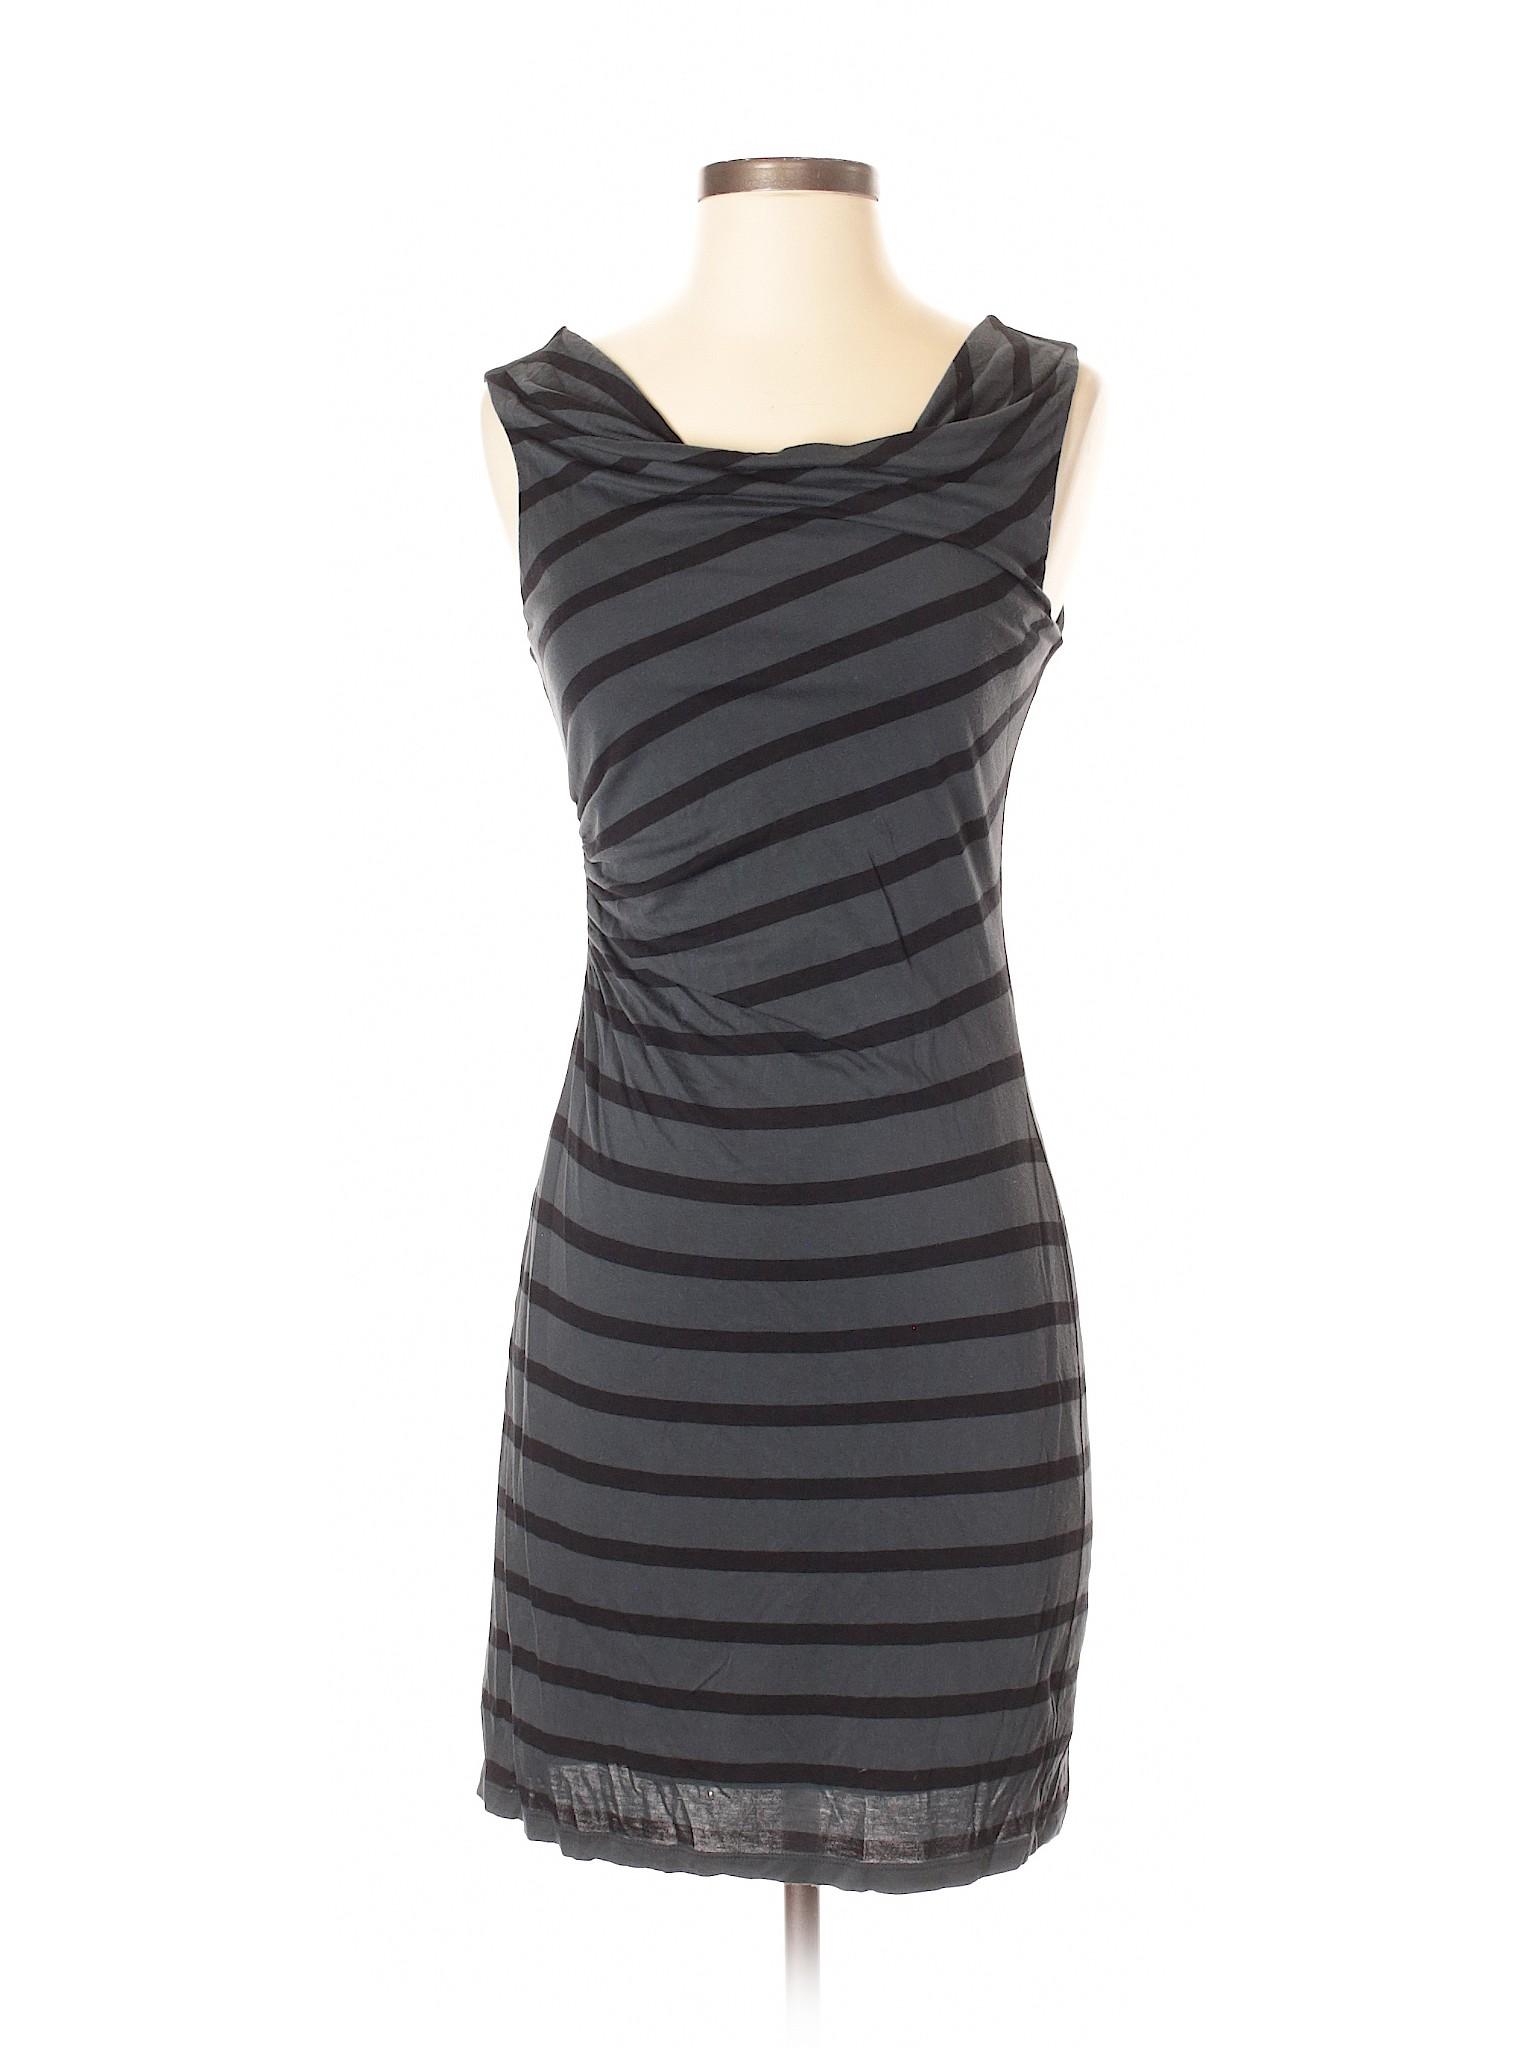 Boutique Casual Ann Dress LOFT Taylor winter rnqBwYTr